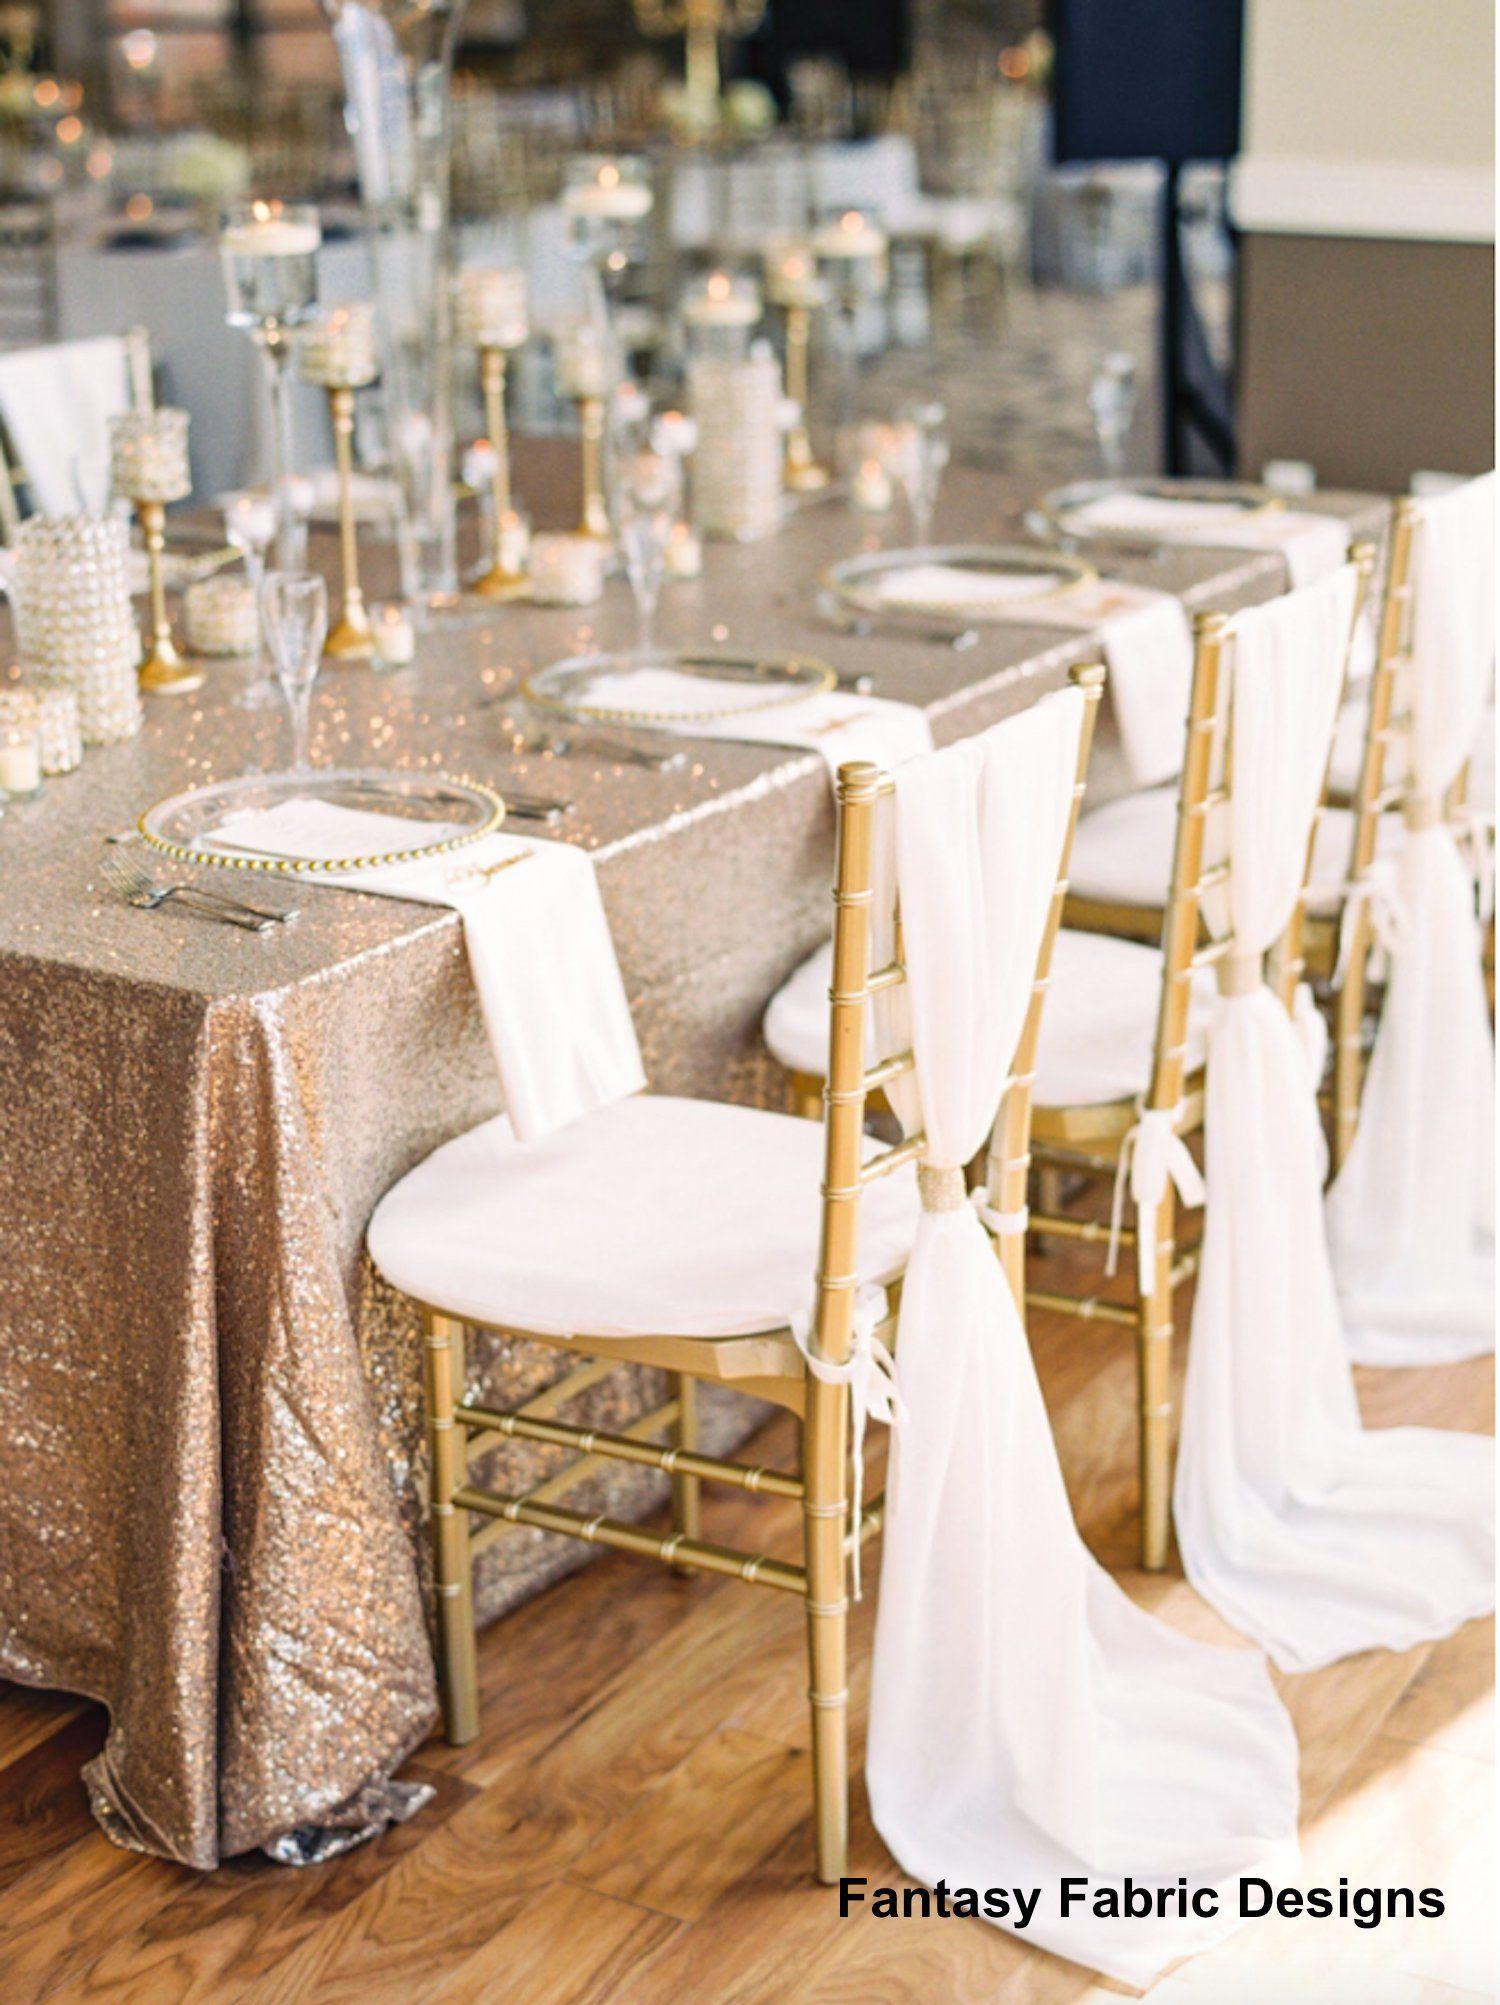 Sale Bulk 50 Wedding Decor Wedding Chair Covers Chair Sash Chiffon Chair Sash Wedding Chair Covers C Chiavari Chairs Chair Covers Wedding Chair Cushions